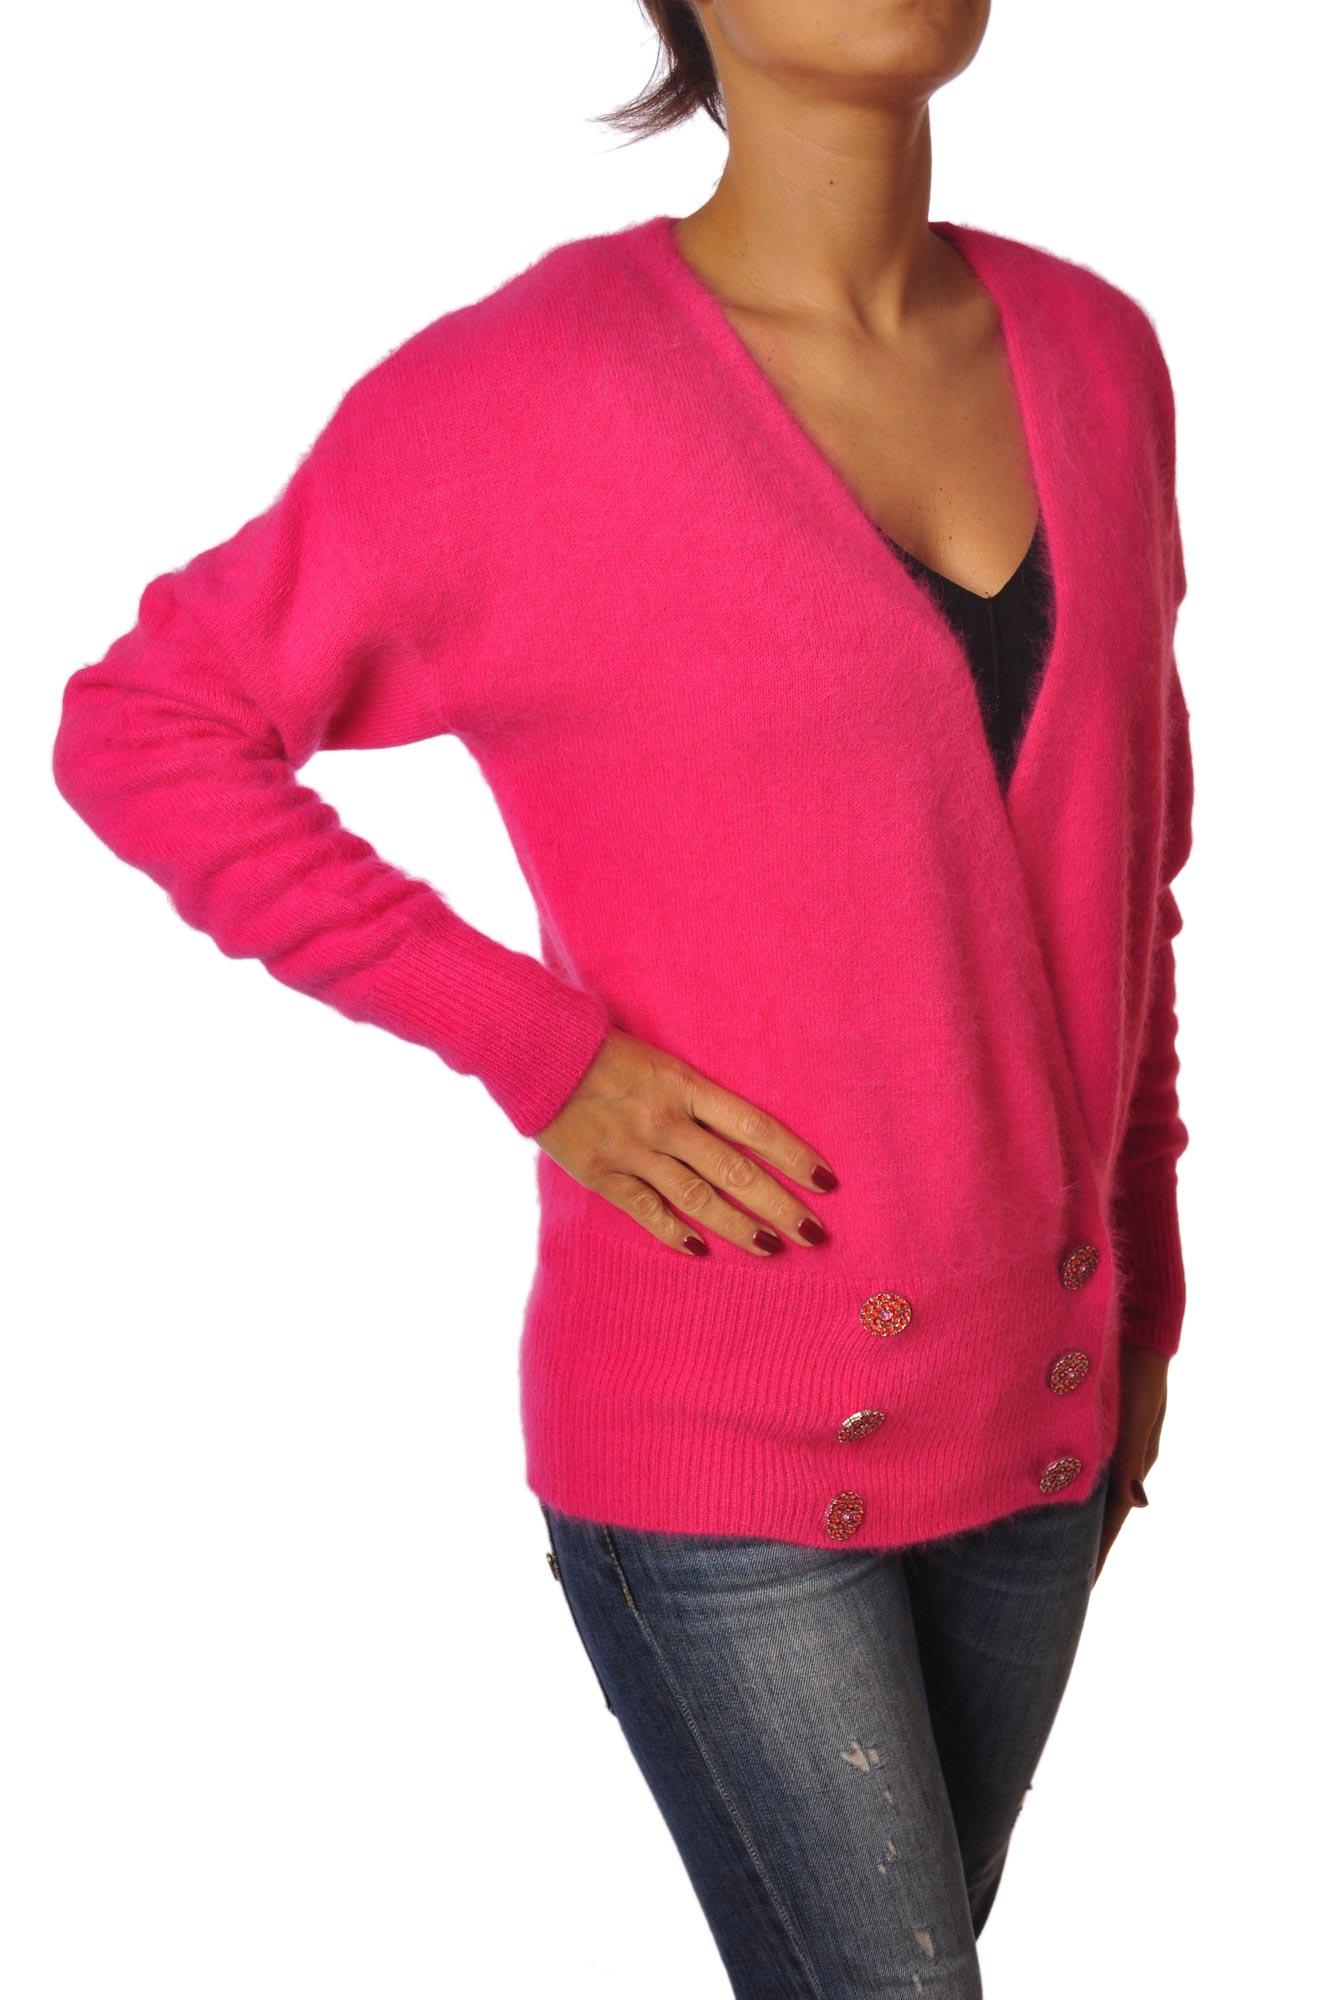 Footlocker Pictures Cheap Price Shopping Online Clearance KNITWEAR - Cardigans Pinko Cheap Ebay RcNygYk4